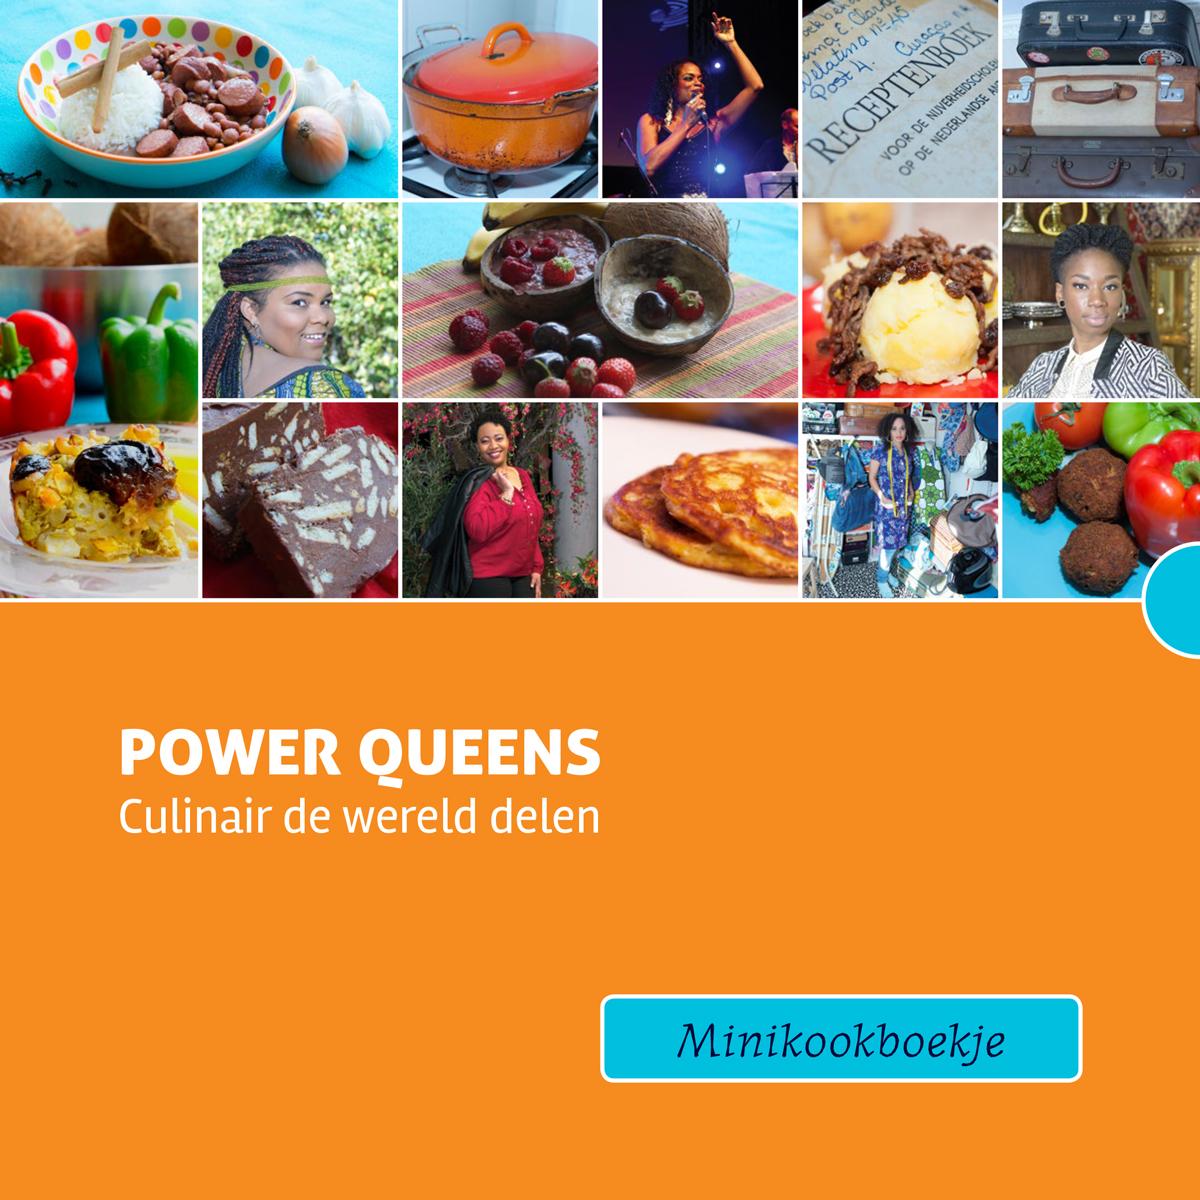 Power Queens minikookboekPower Queens minikookboek